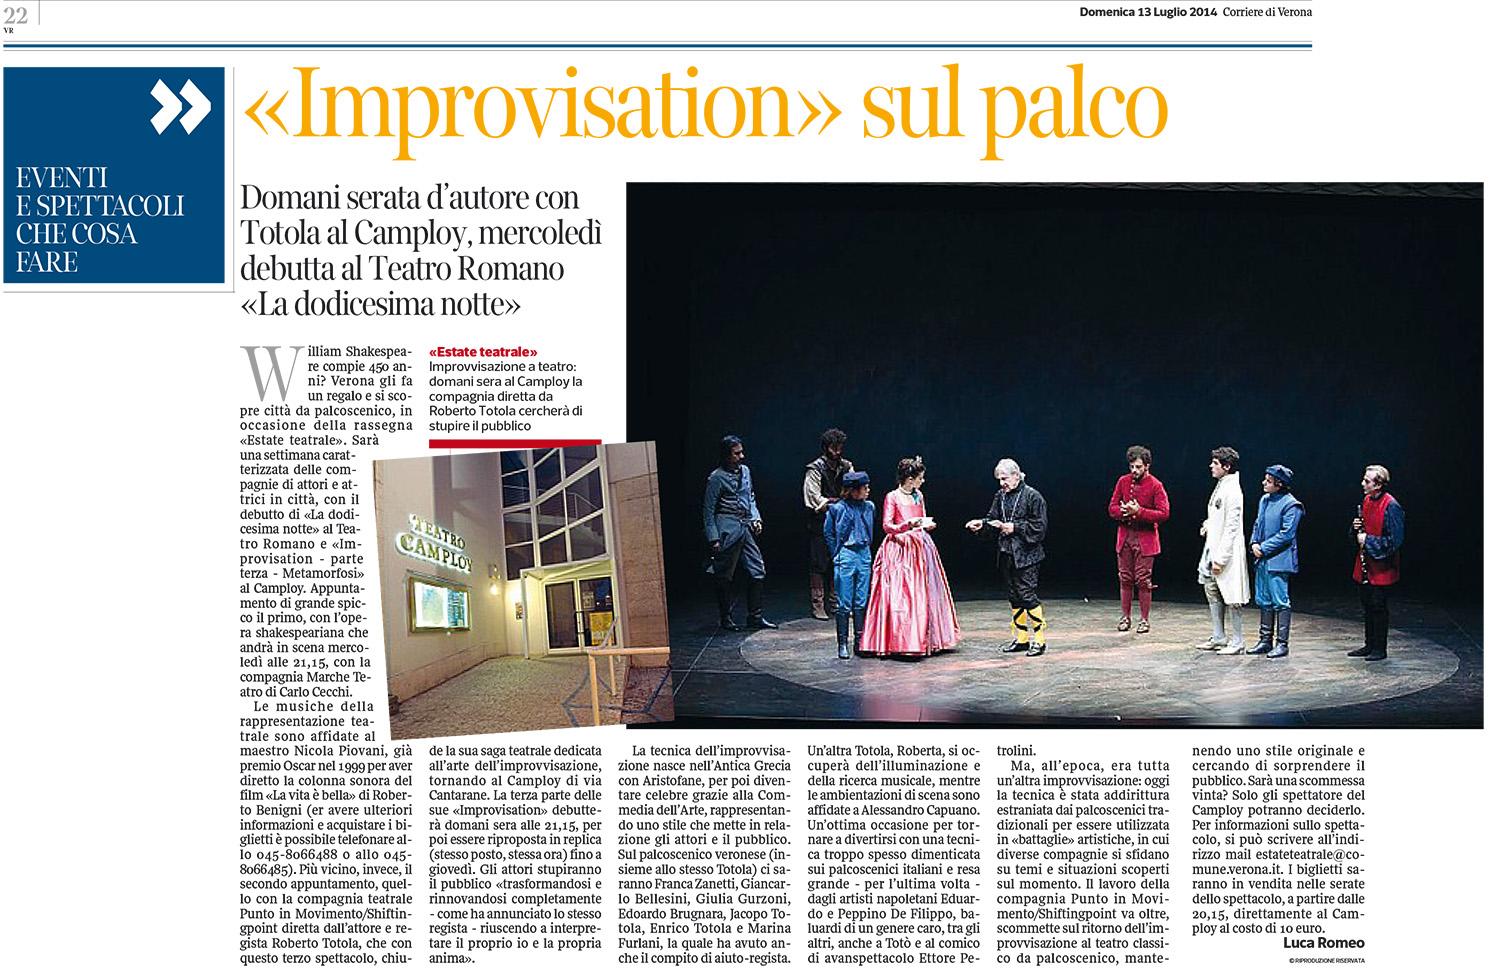 2014.07.13 'Improvisation' sul palco - Corriere di Verona